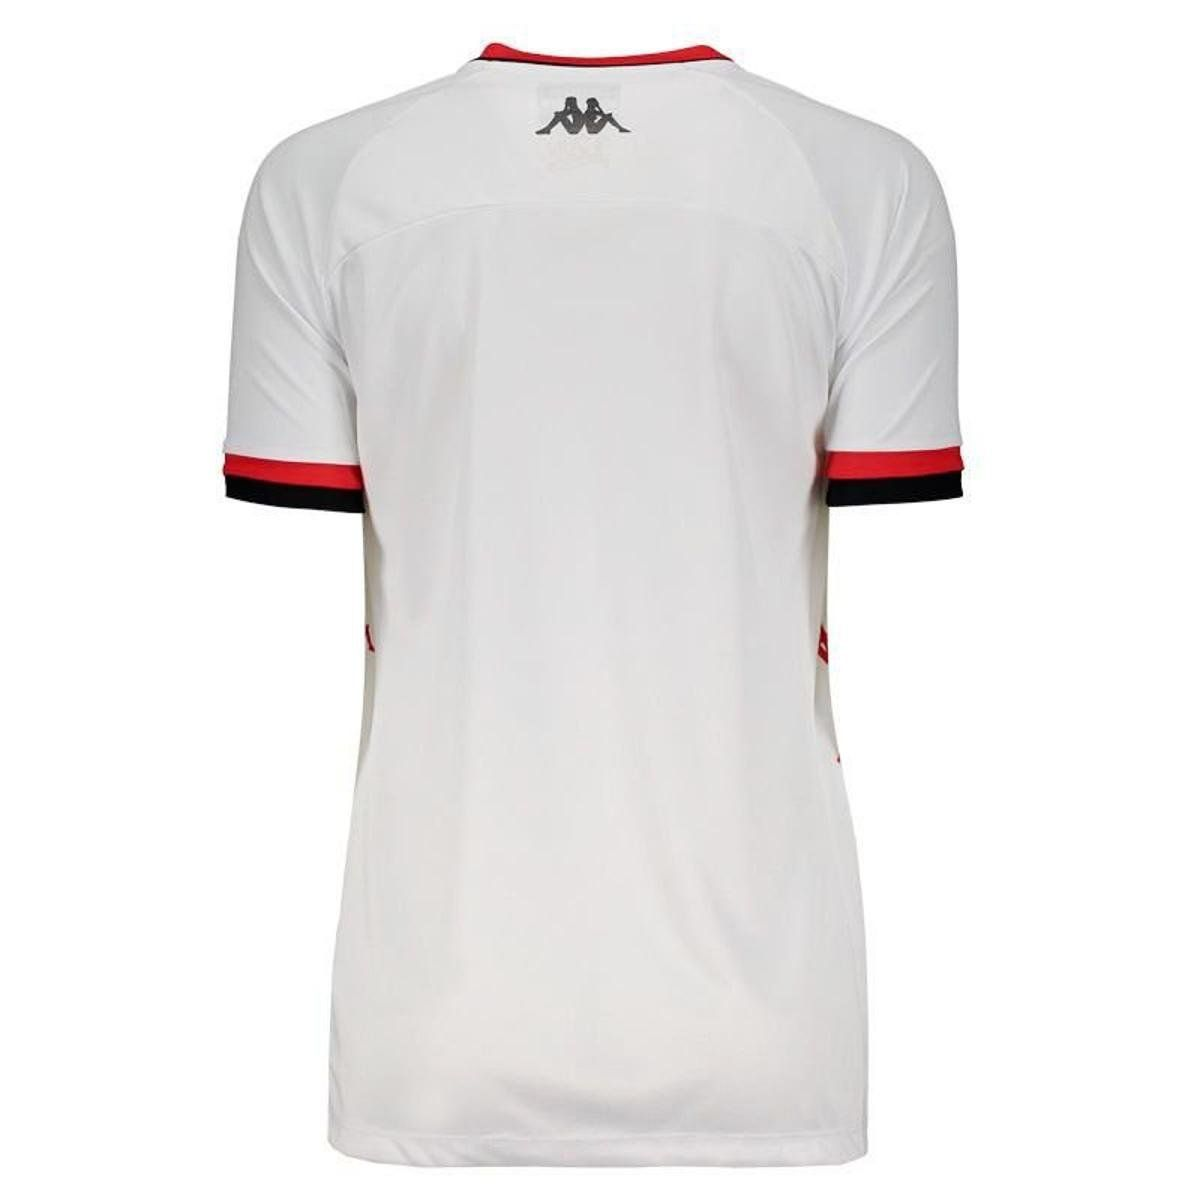 Camisa Jogo II - Kappa - 2019 - Feminino - Branco